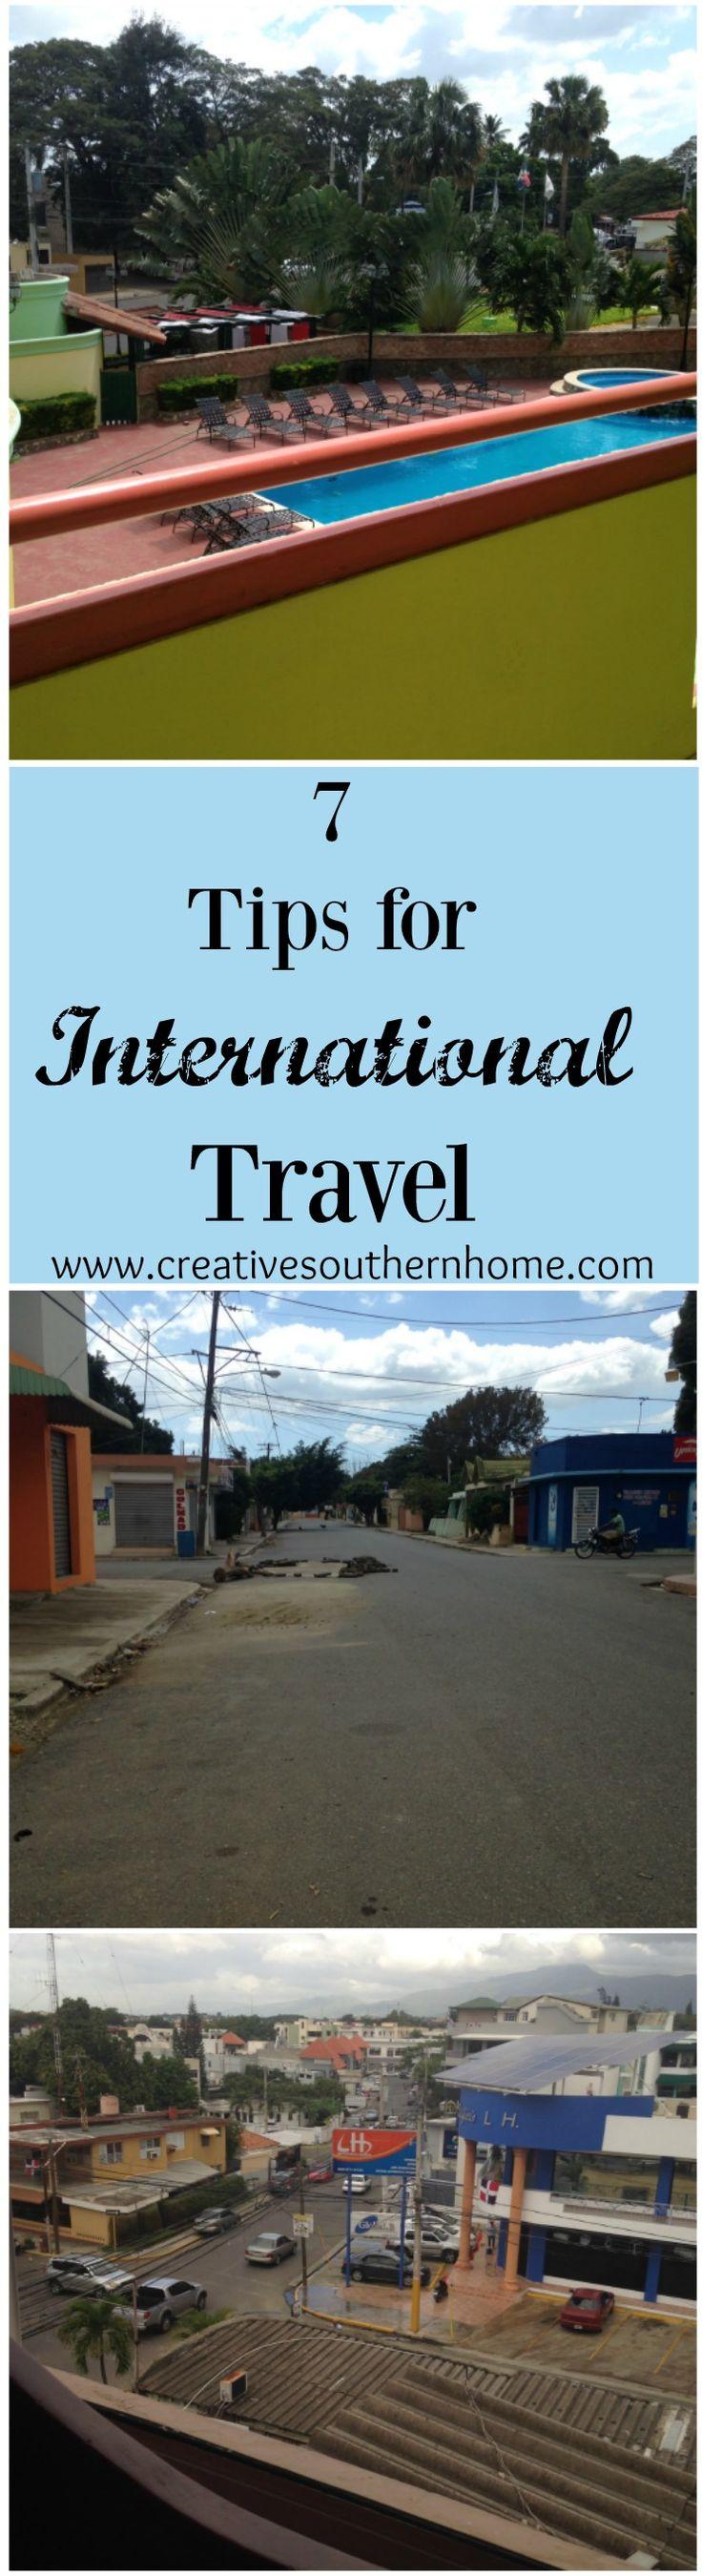 7 tips every international traveler needs to know. www.creativesouthernhome.com